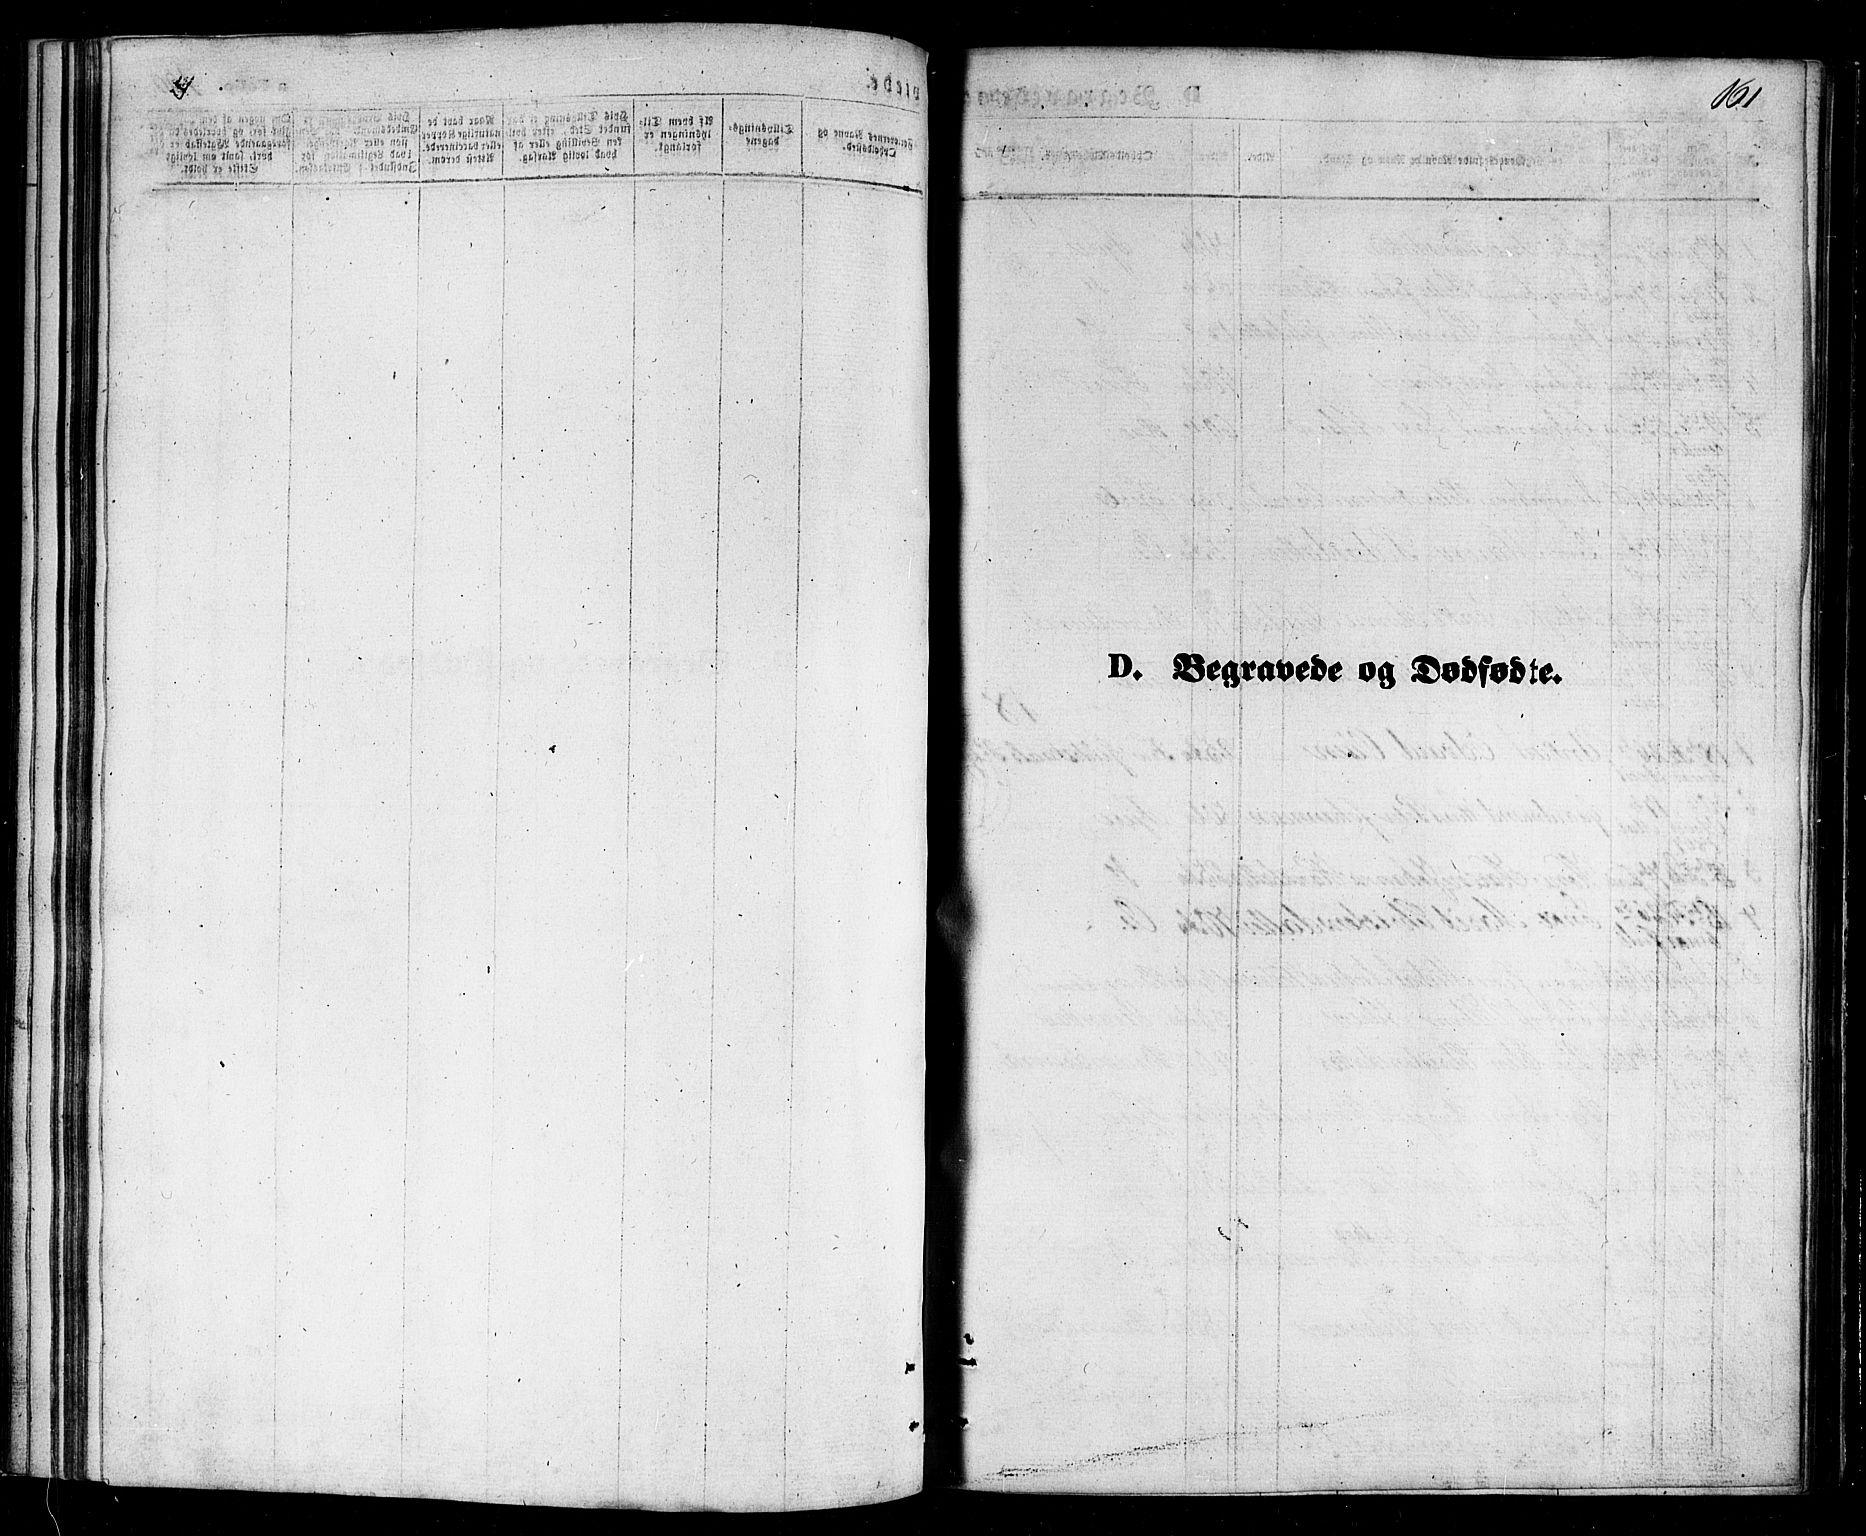 SAT, Ministerialprotokoller, klokkerbøker og fødselsregistre - Nordland, 803/L0075: Klokkerbok nr. 803C02, 1867-1881, s. 161